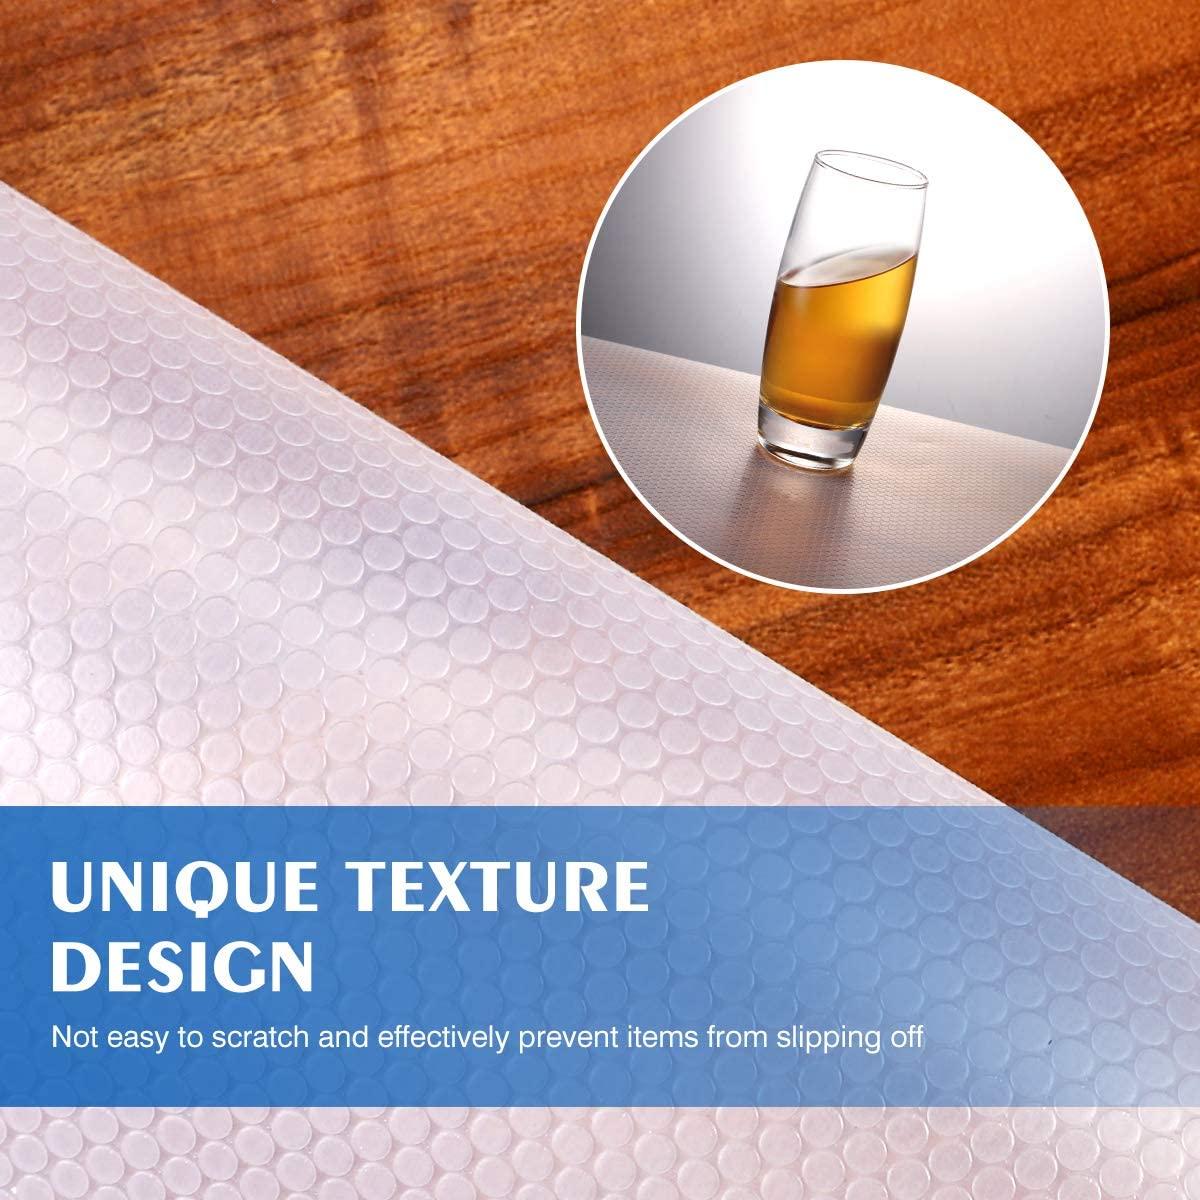 Shelf Liner, 2 Rolls Non-Adhesive Drawer Liner Versatile Kitchen Cabinet Liners Non-Slip Liners